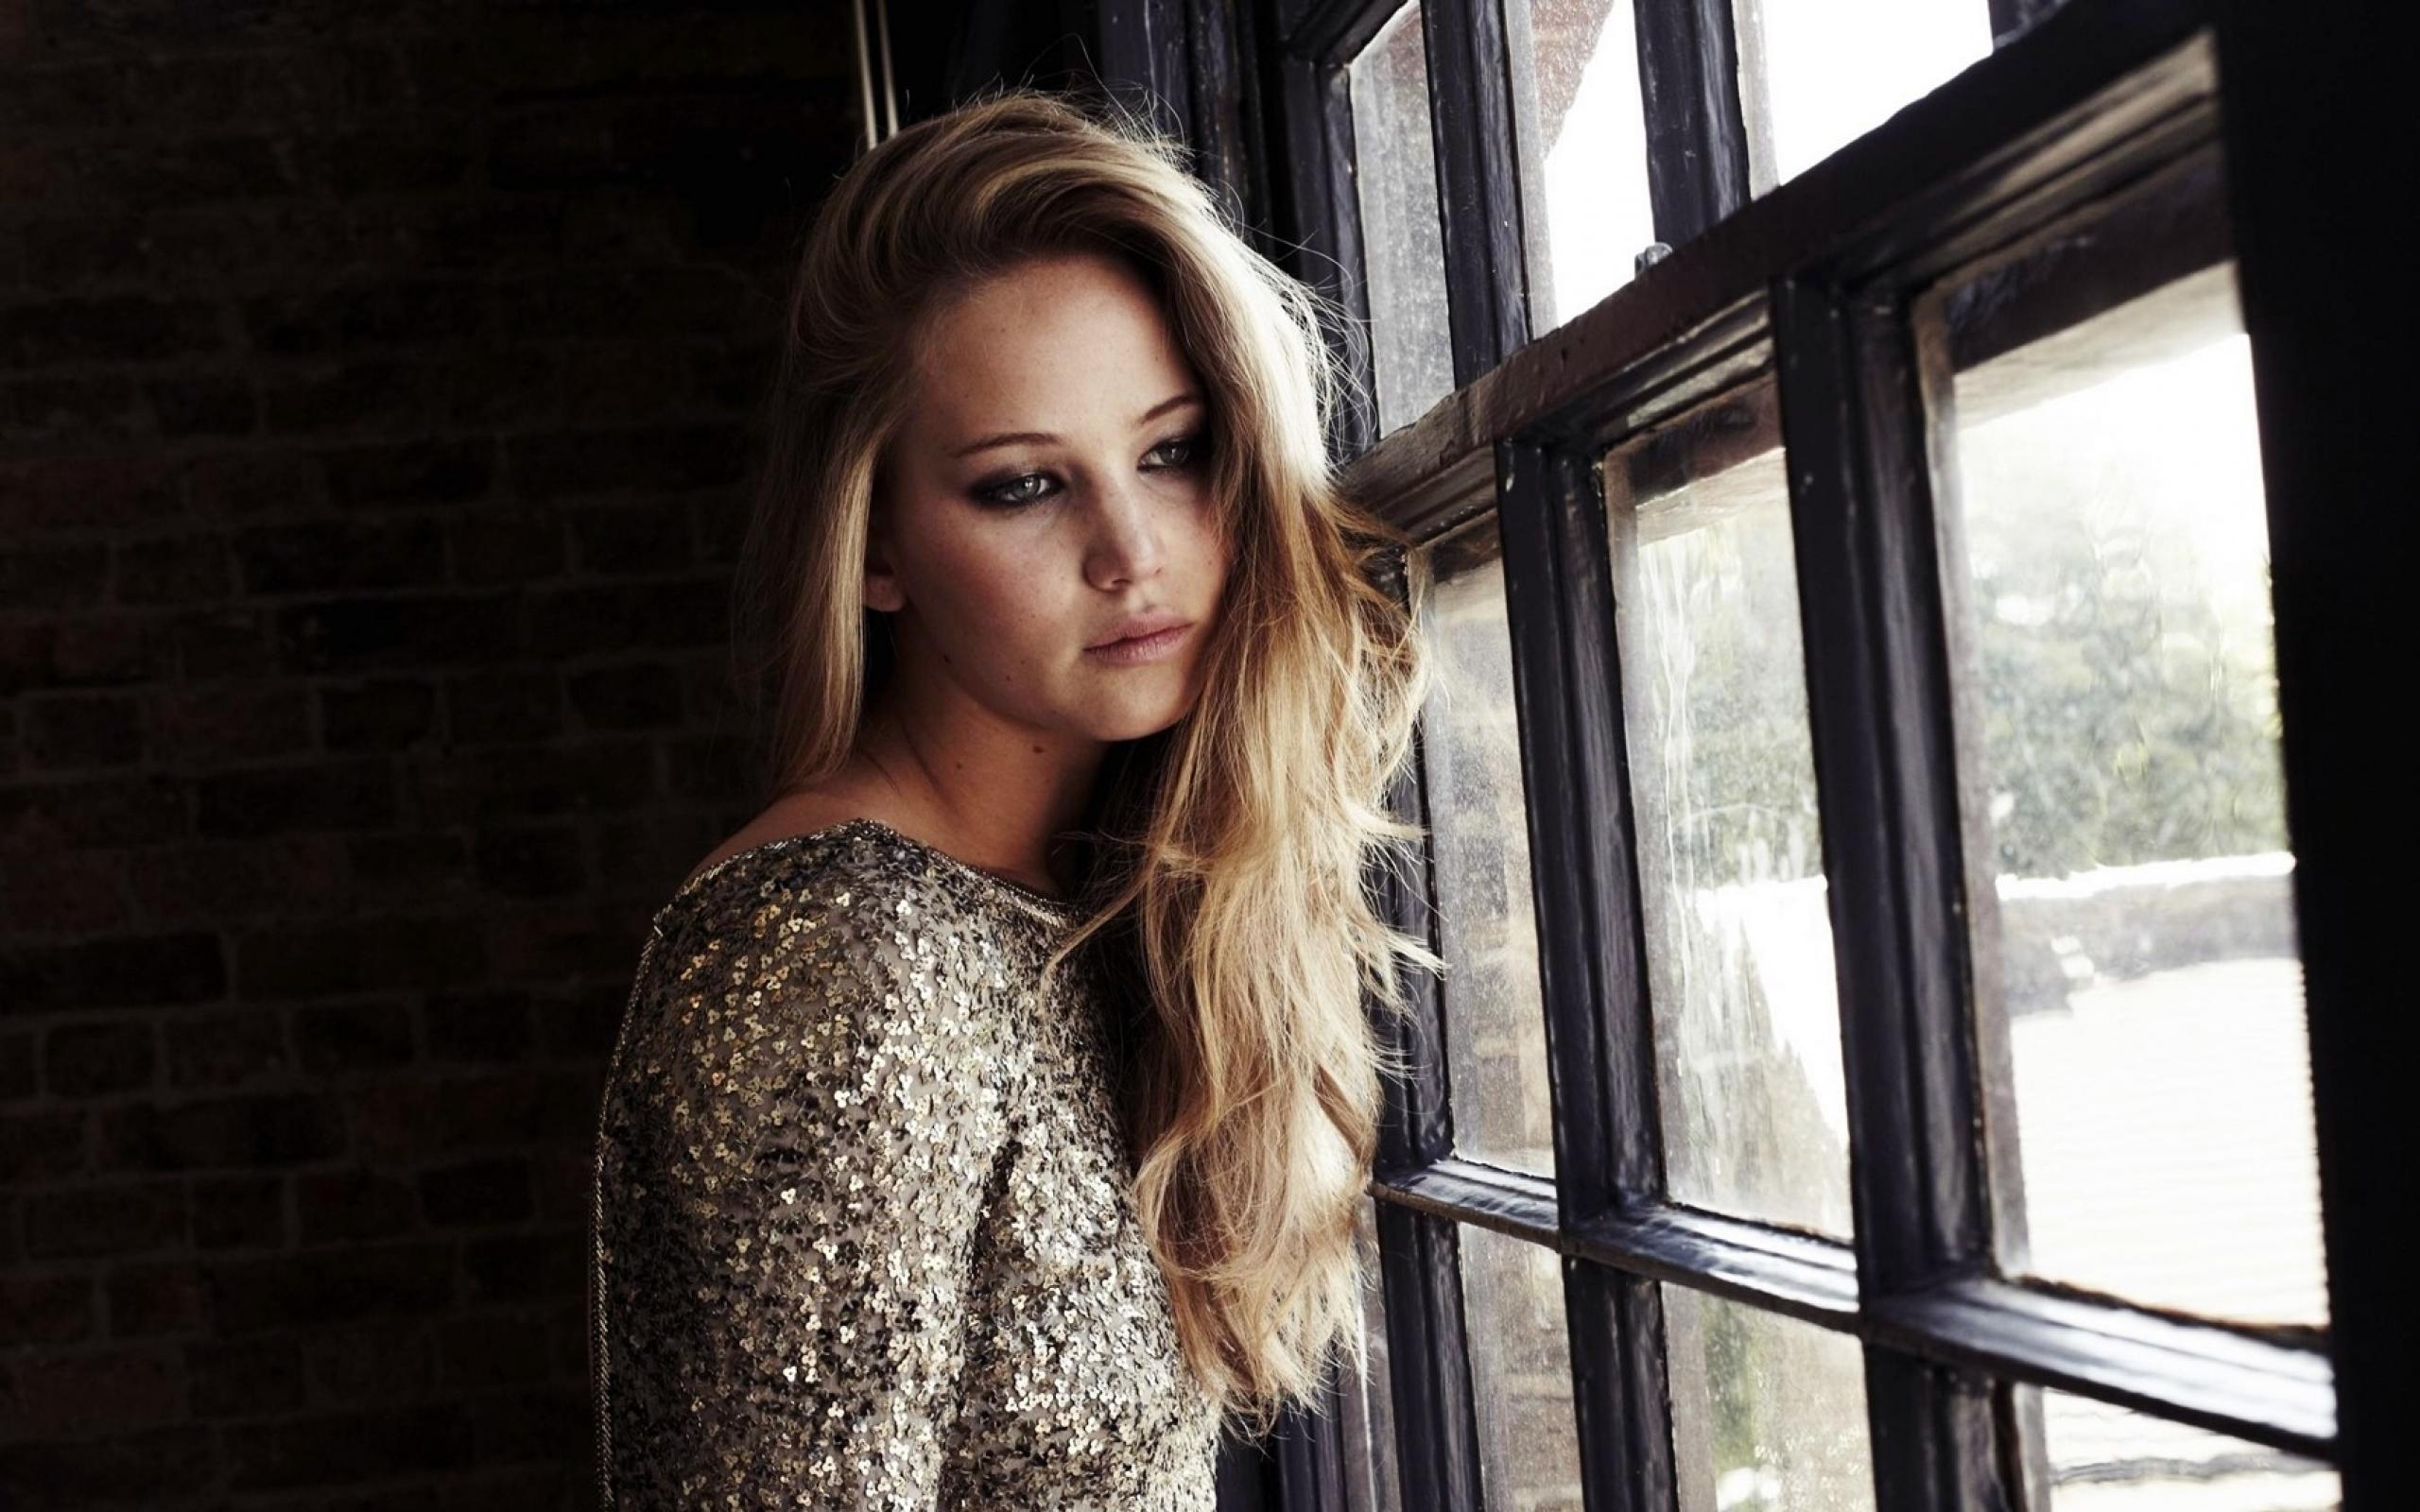 Jennifer Lawrence x iPhone S wallpaper background